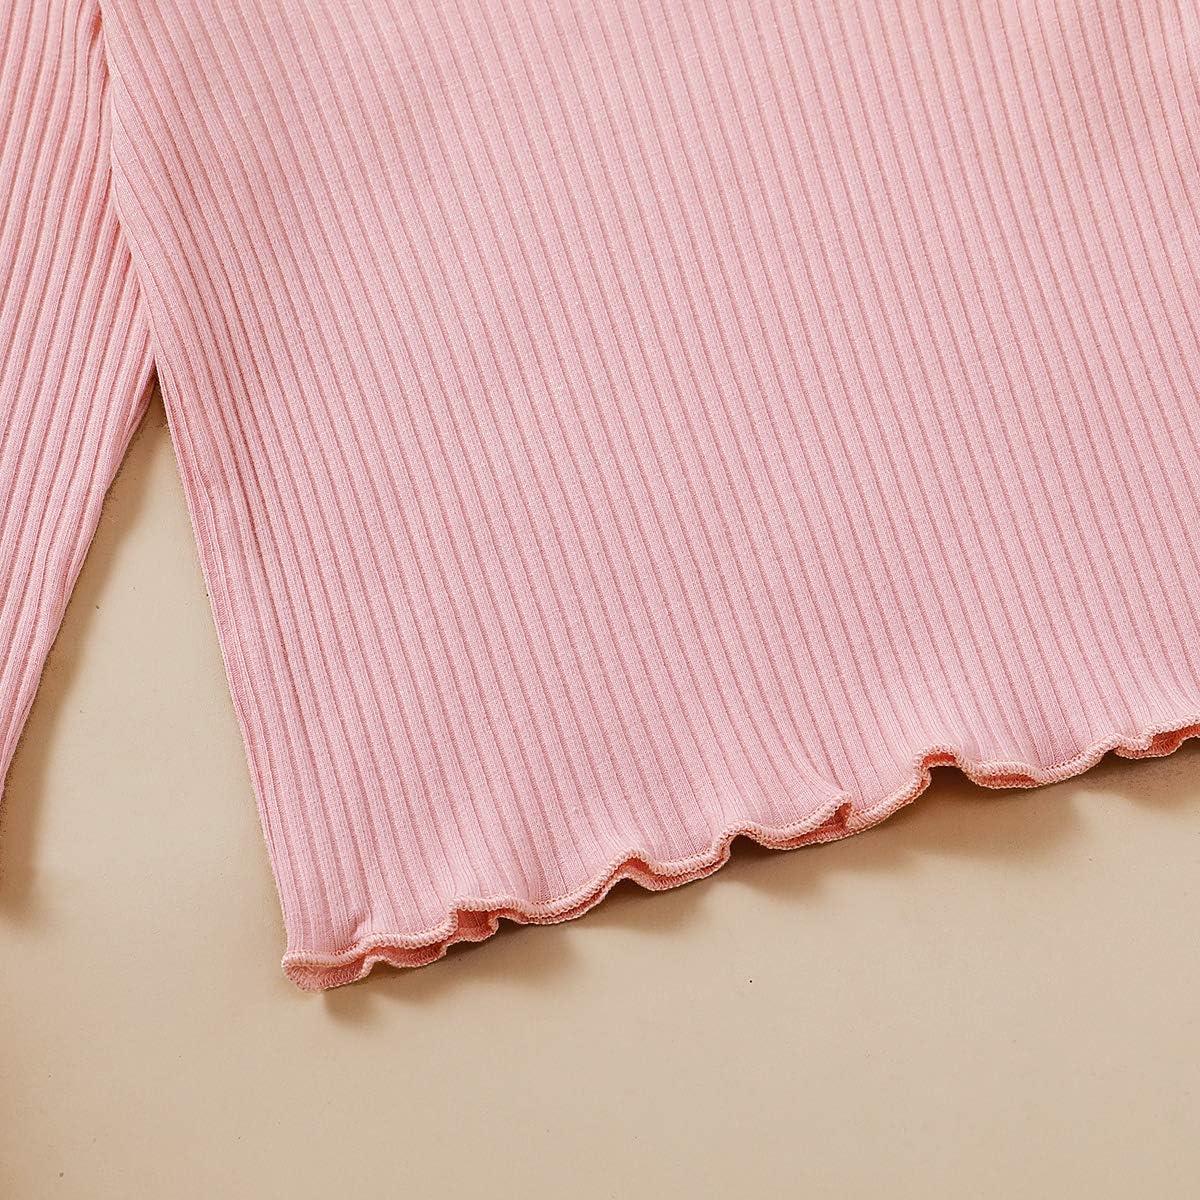 Toddler Kids Girls Pajamas Long Sleeve Cotton Pjs Solid Sleepover Footless Sleepwear Pants Two Piece Clothes Set